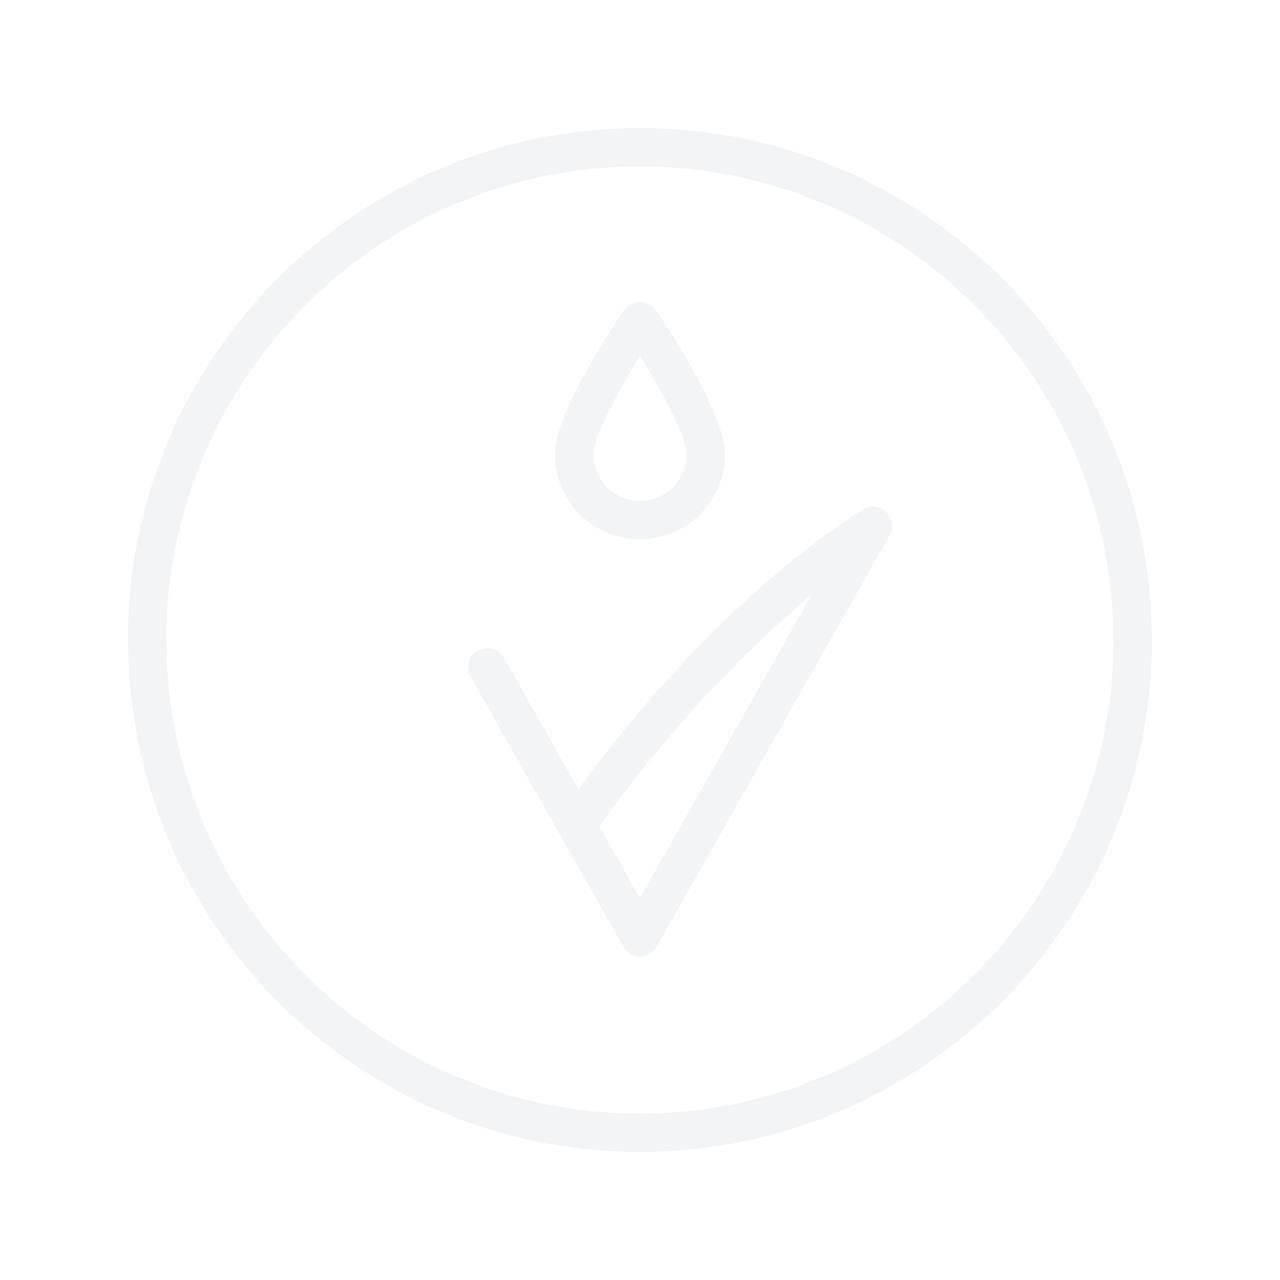 Clarins Everlasting Foundation+ SPF15 No.105 Nude 30ml